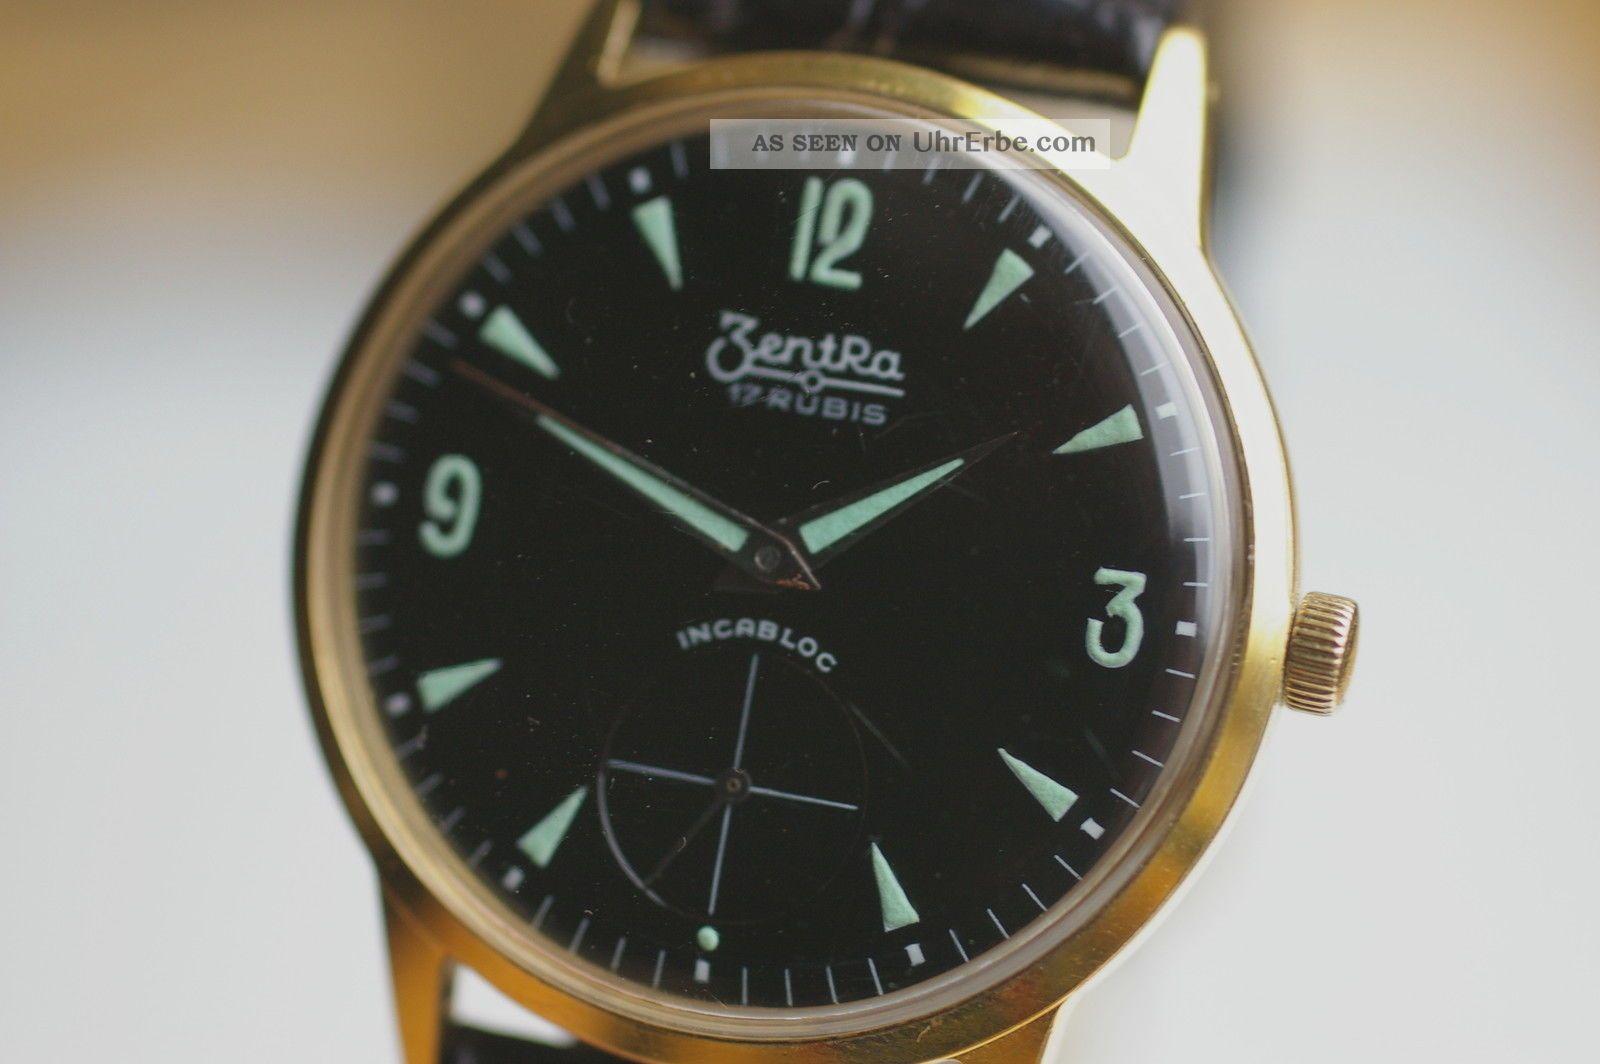 Zentra Armbanduhr Schwarzes Zifferblatt Kaliber As 1560 1960er Jahre Top Armbanduhren Bild